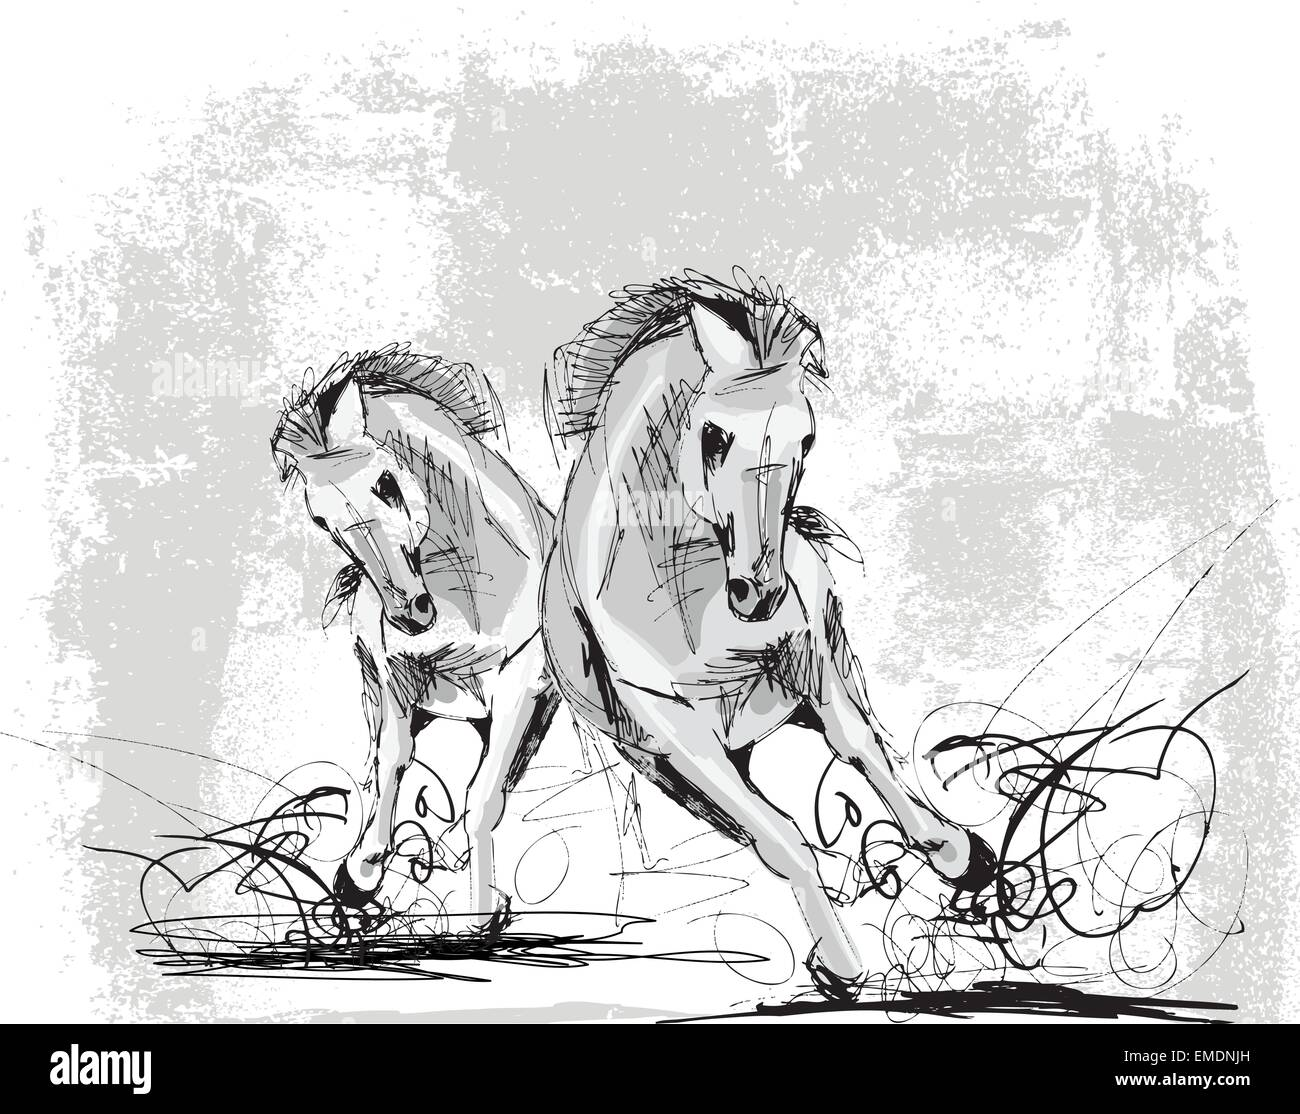 Sketch Of Horses Running Stock Vector Image Art Alamy